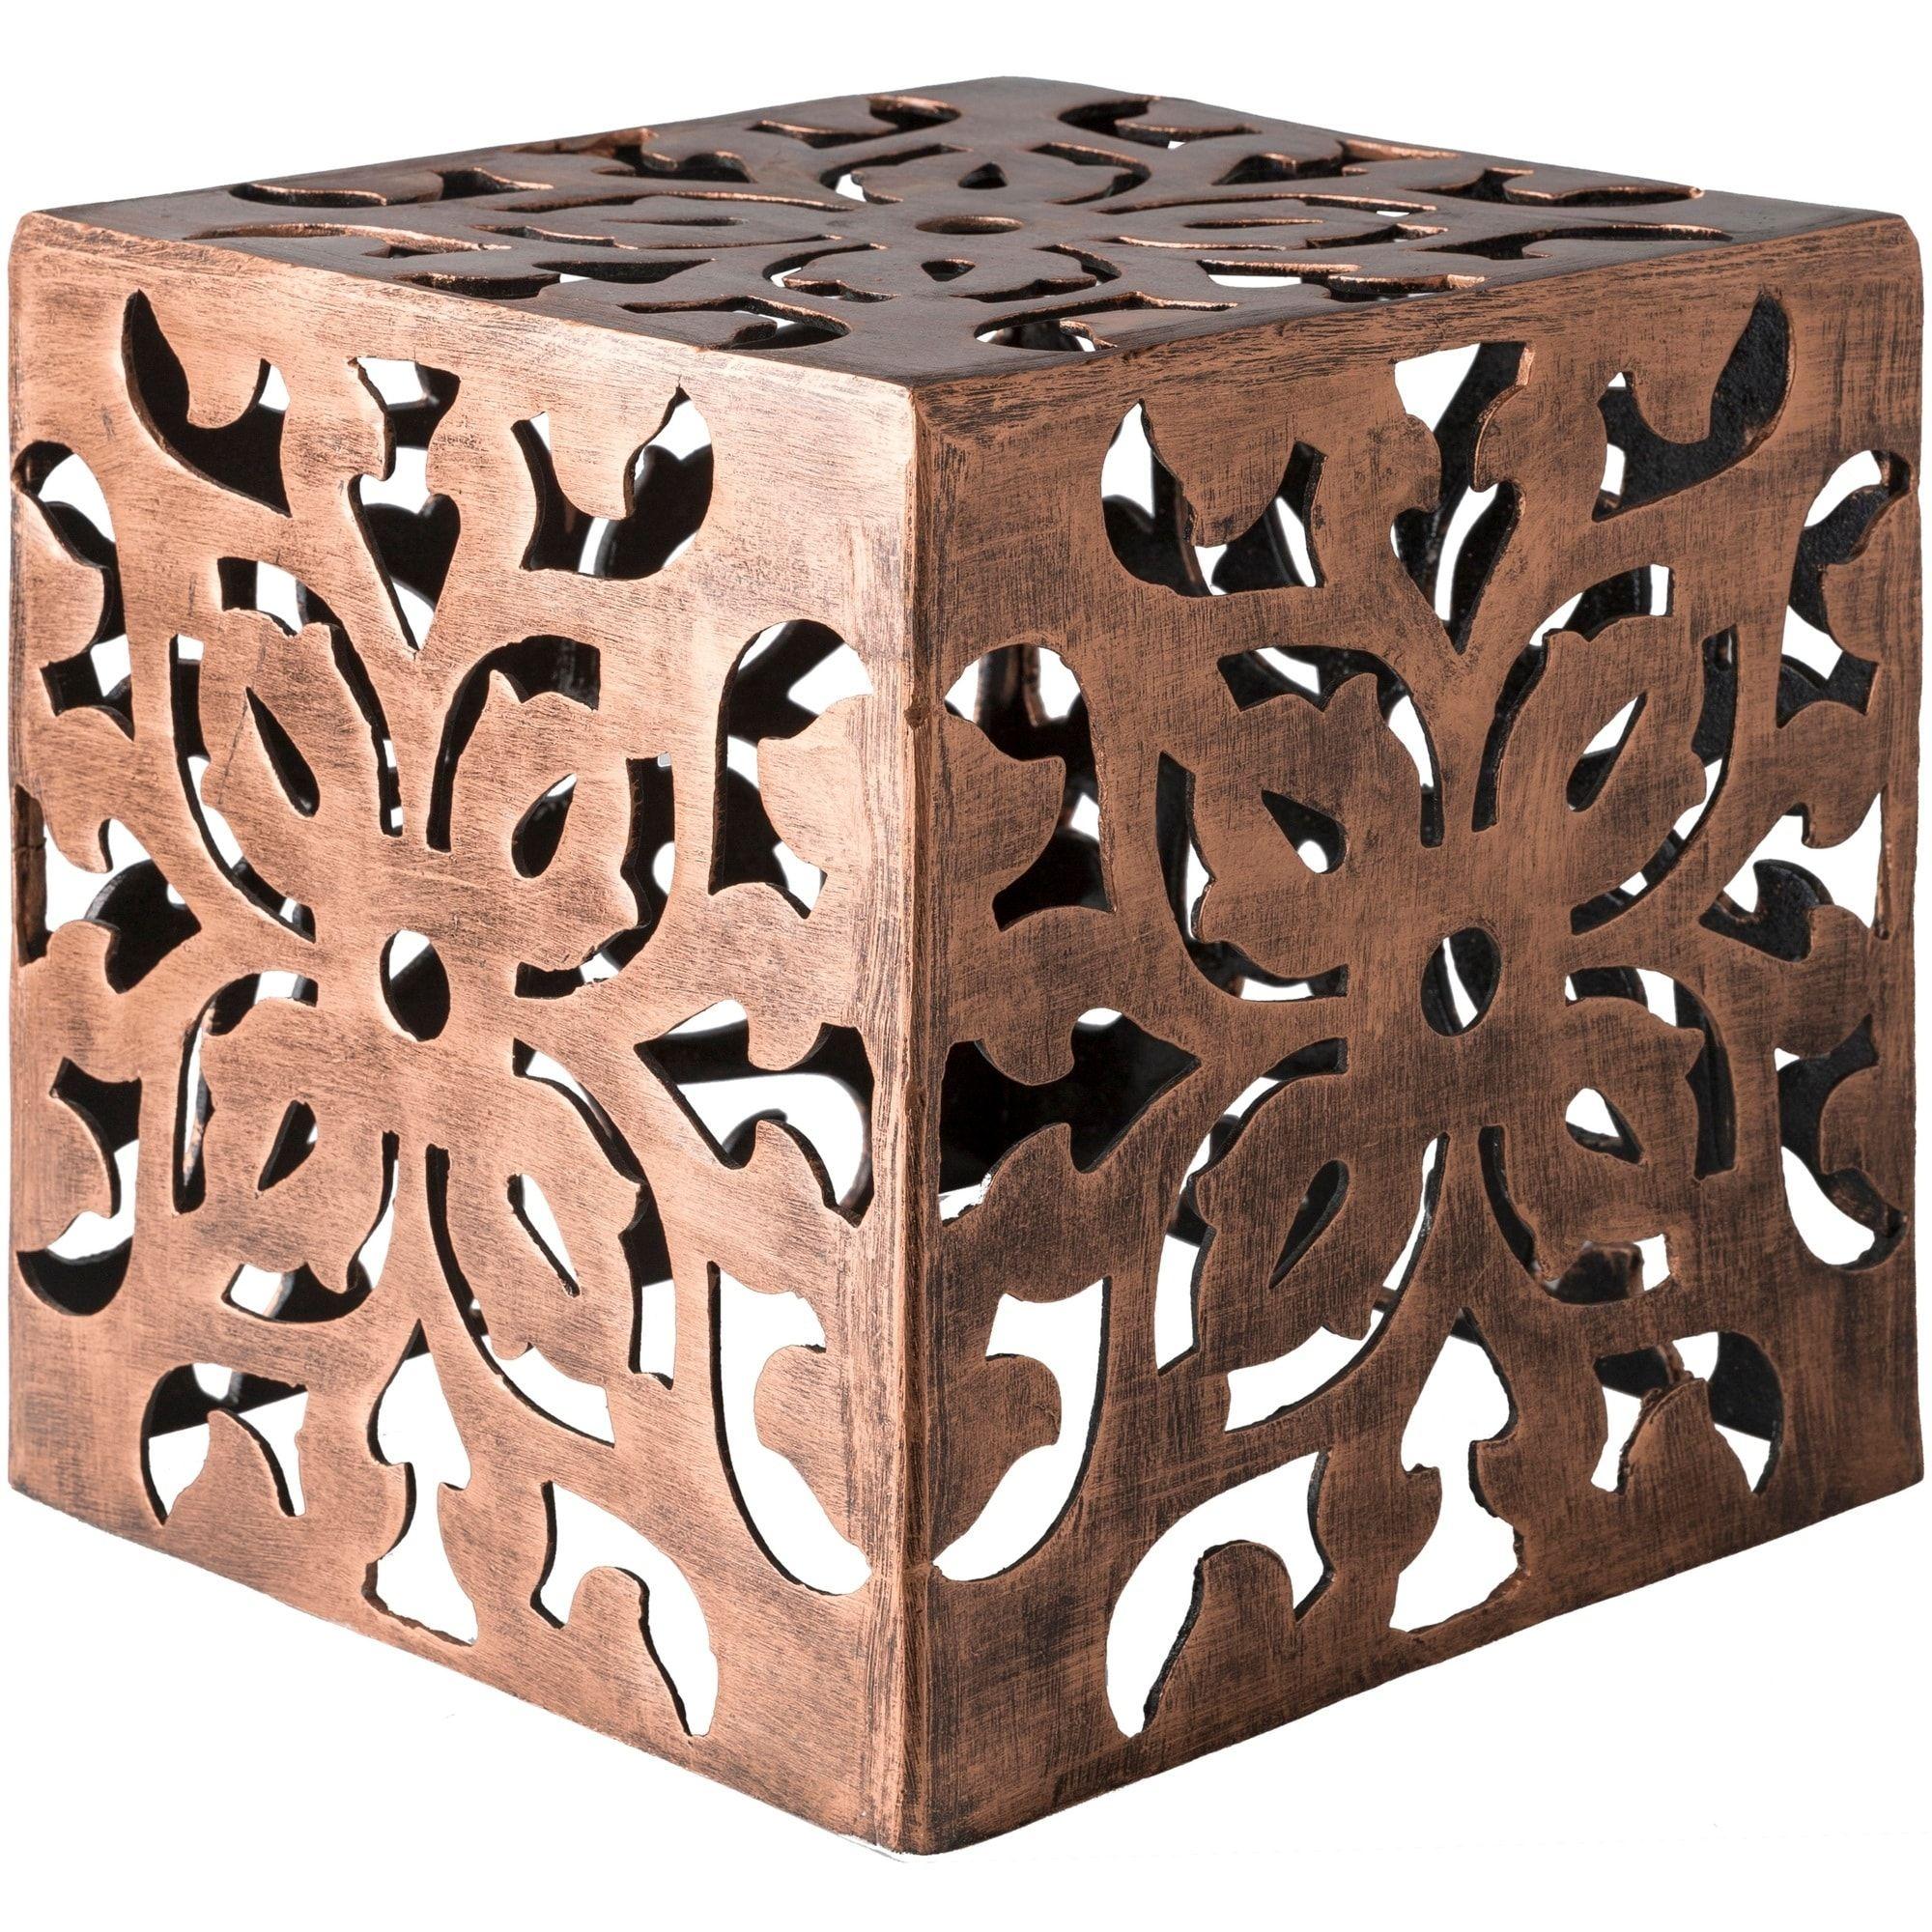 Emideo Copper (Brown) Metal Drum Accent Table